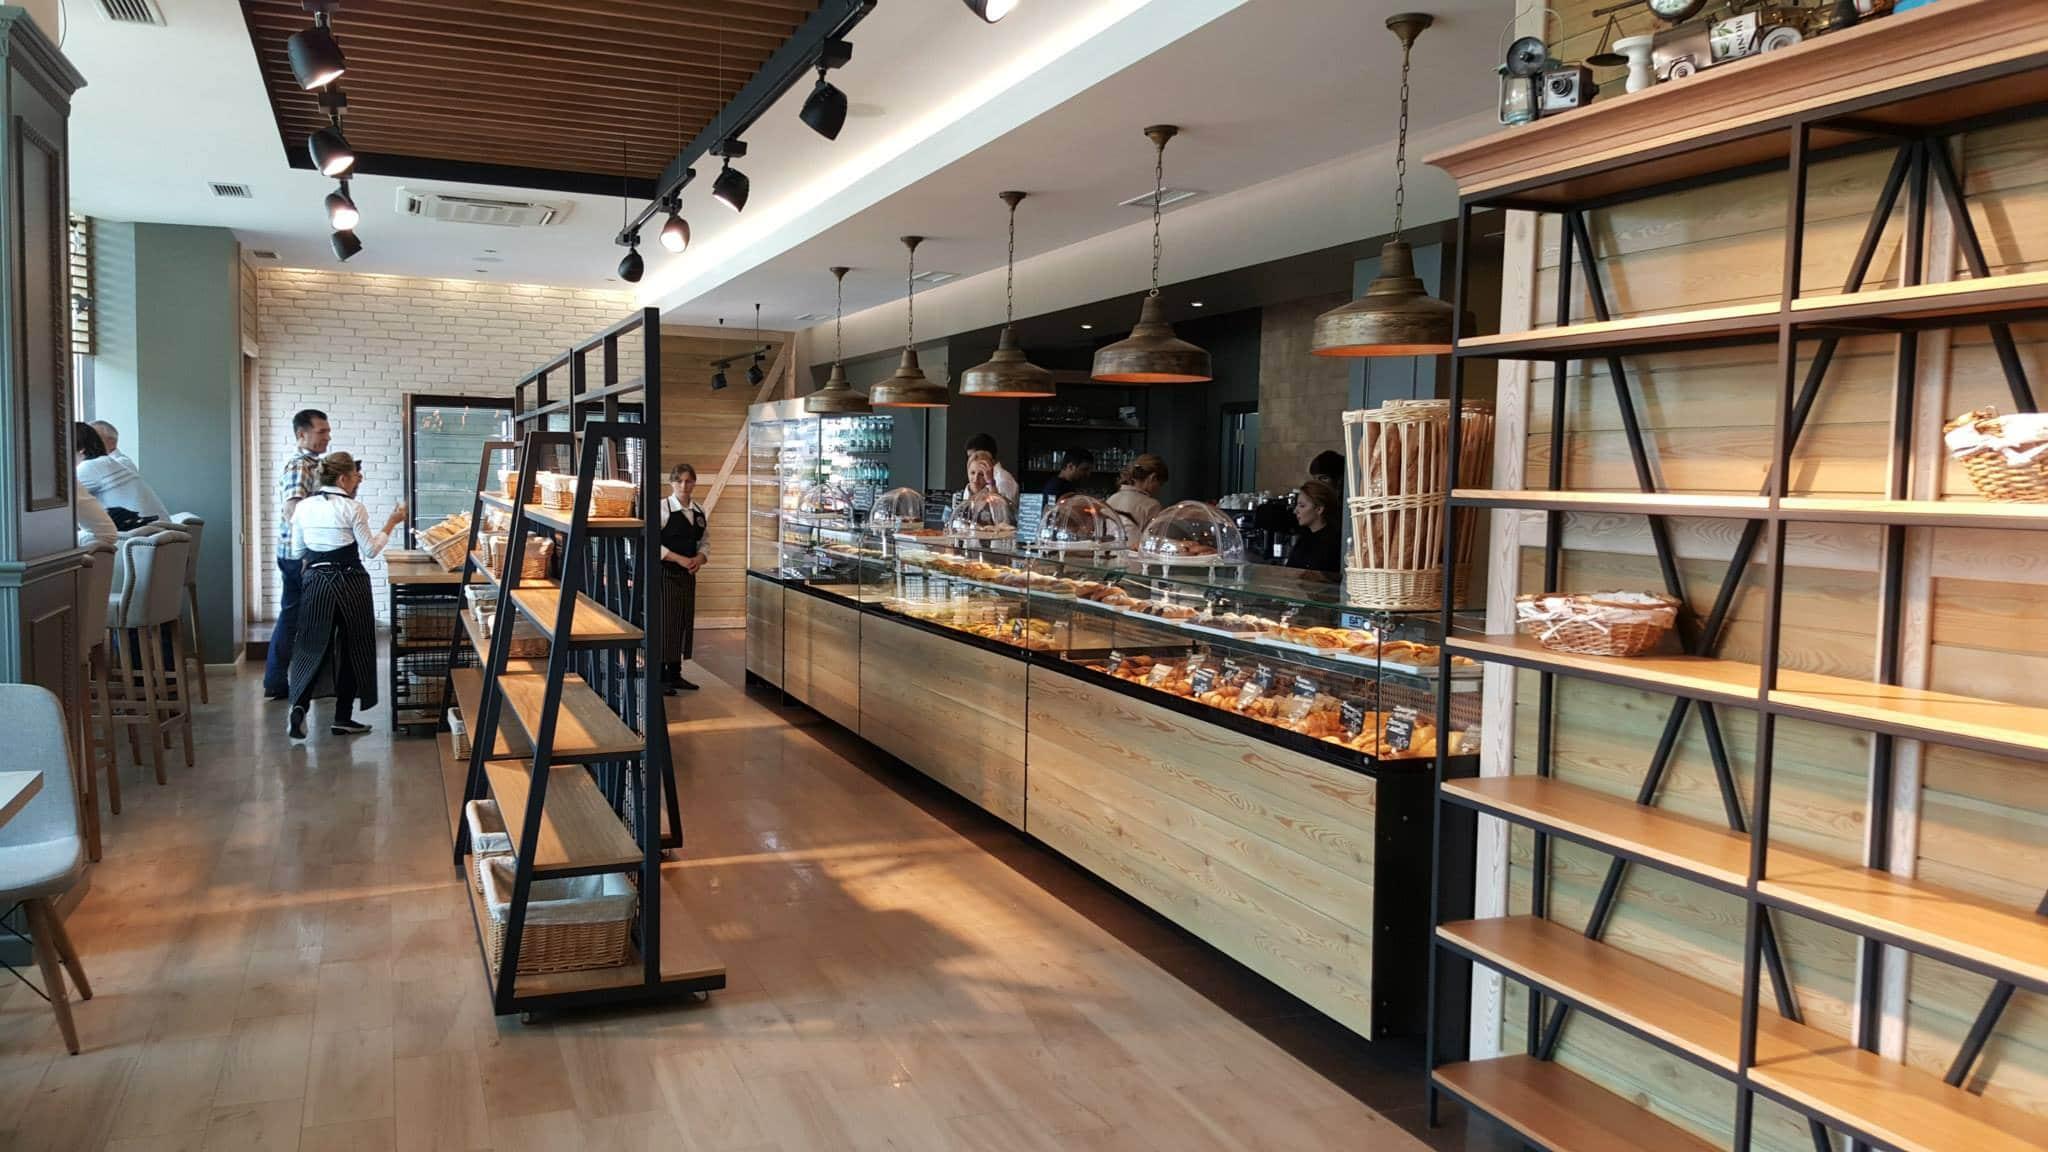 ISA Kelly Showcase pastry cabinet